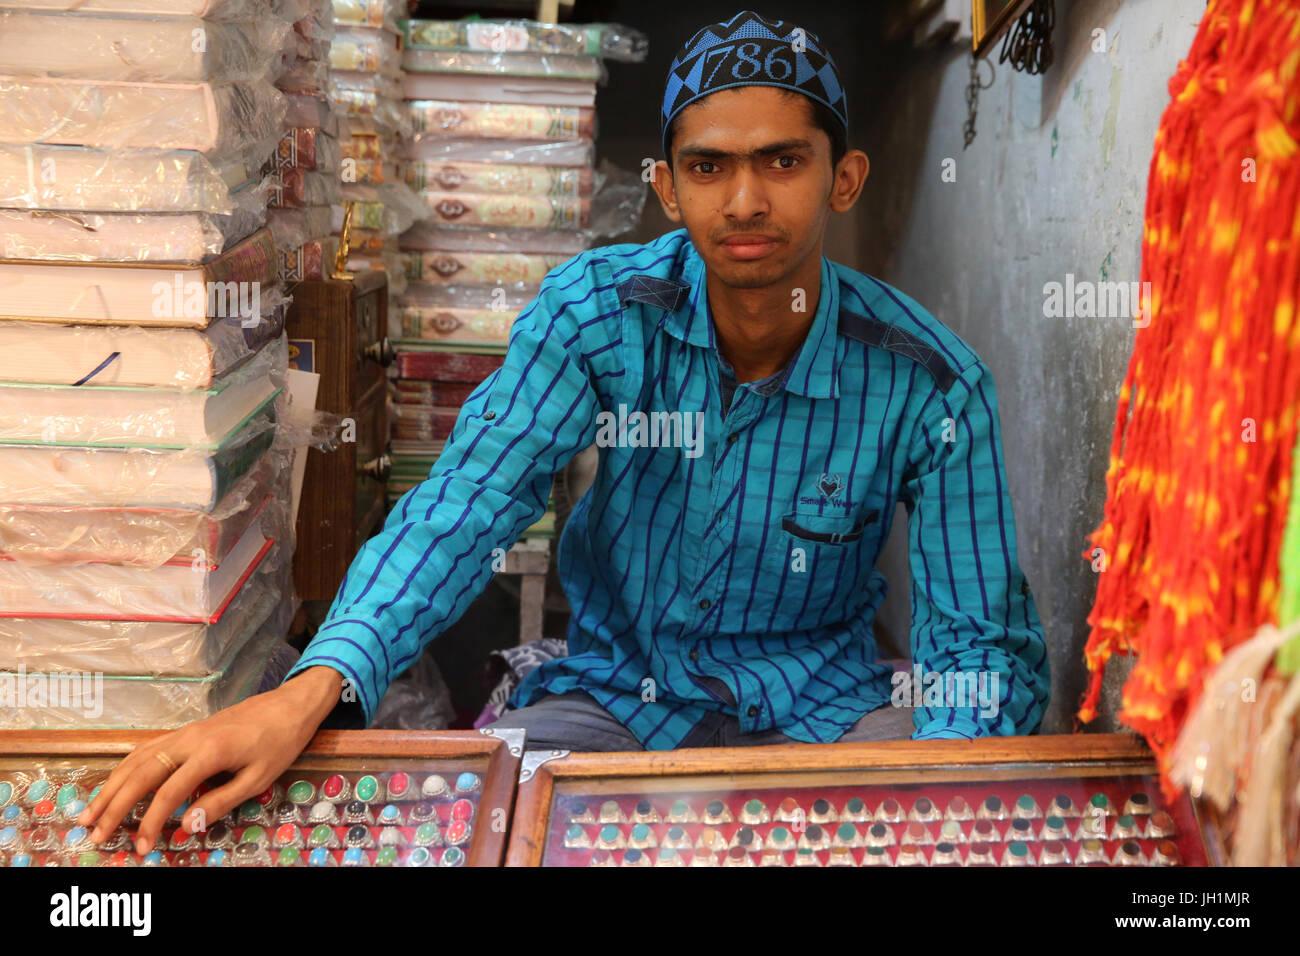 Shop al di fuori di Ajmer dargah Sharif, Rajasthan. India. Immagini Stock